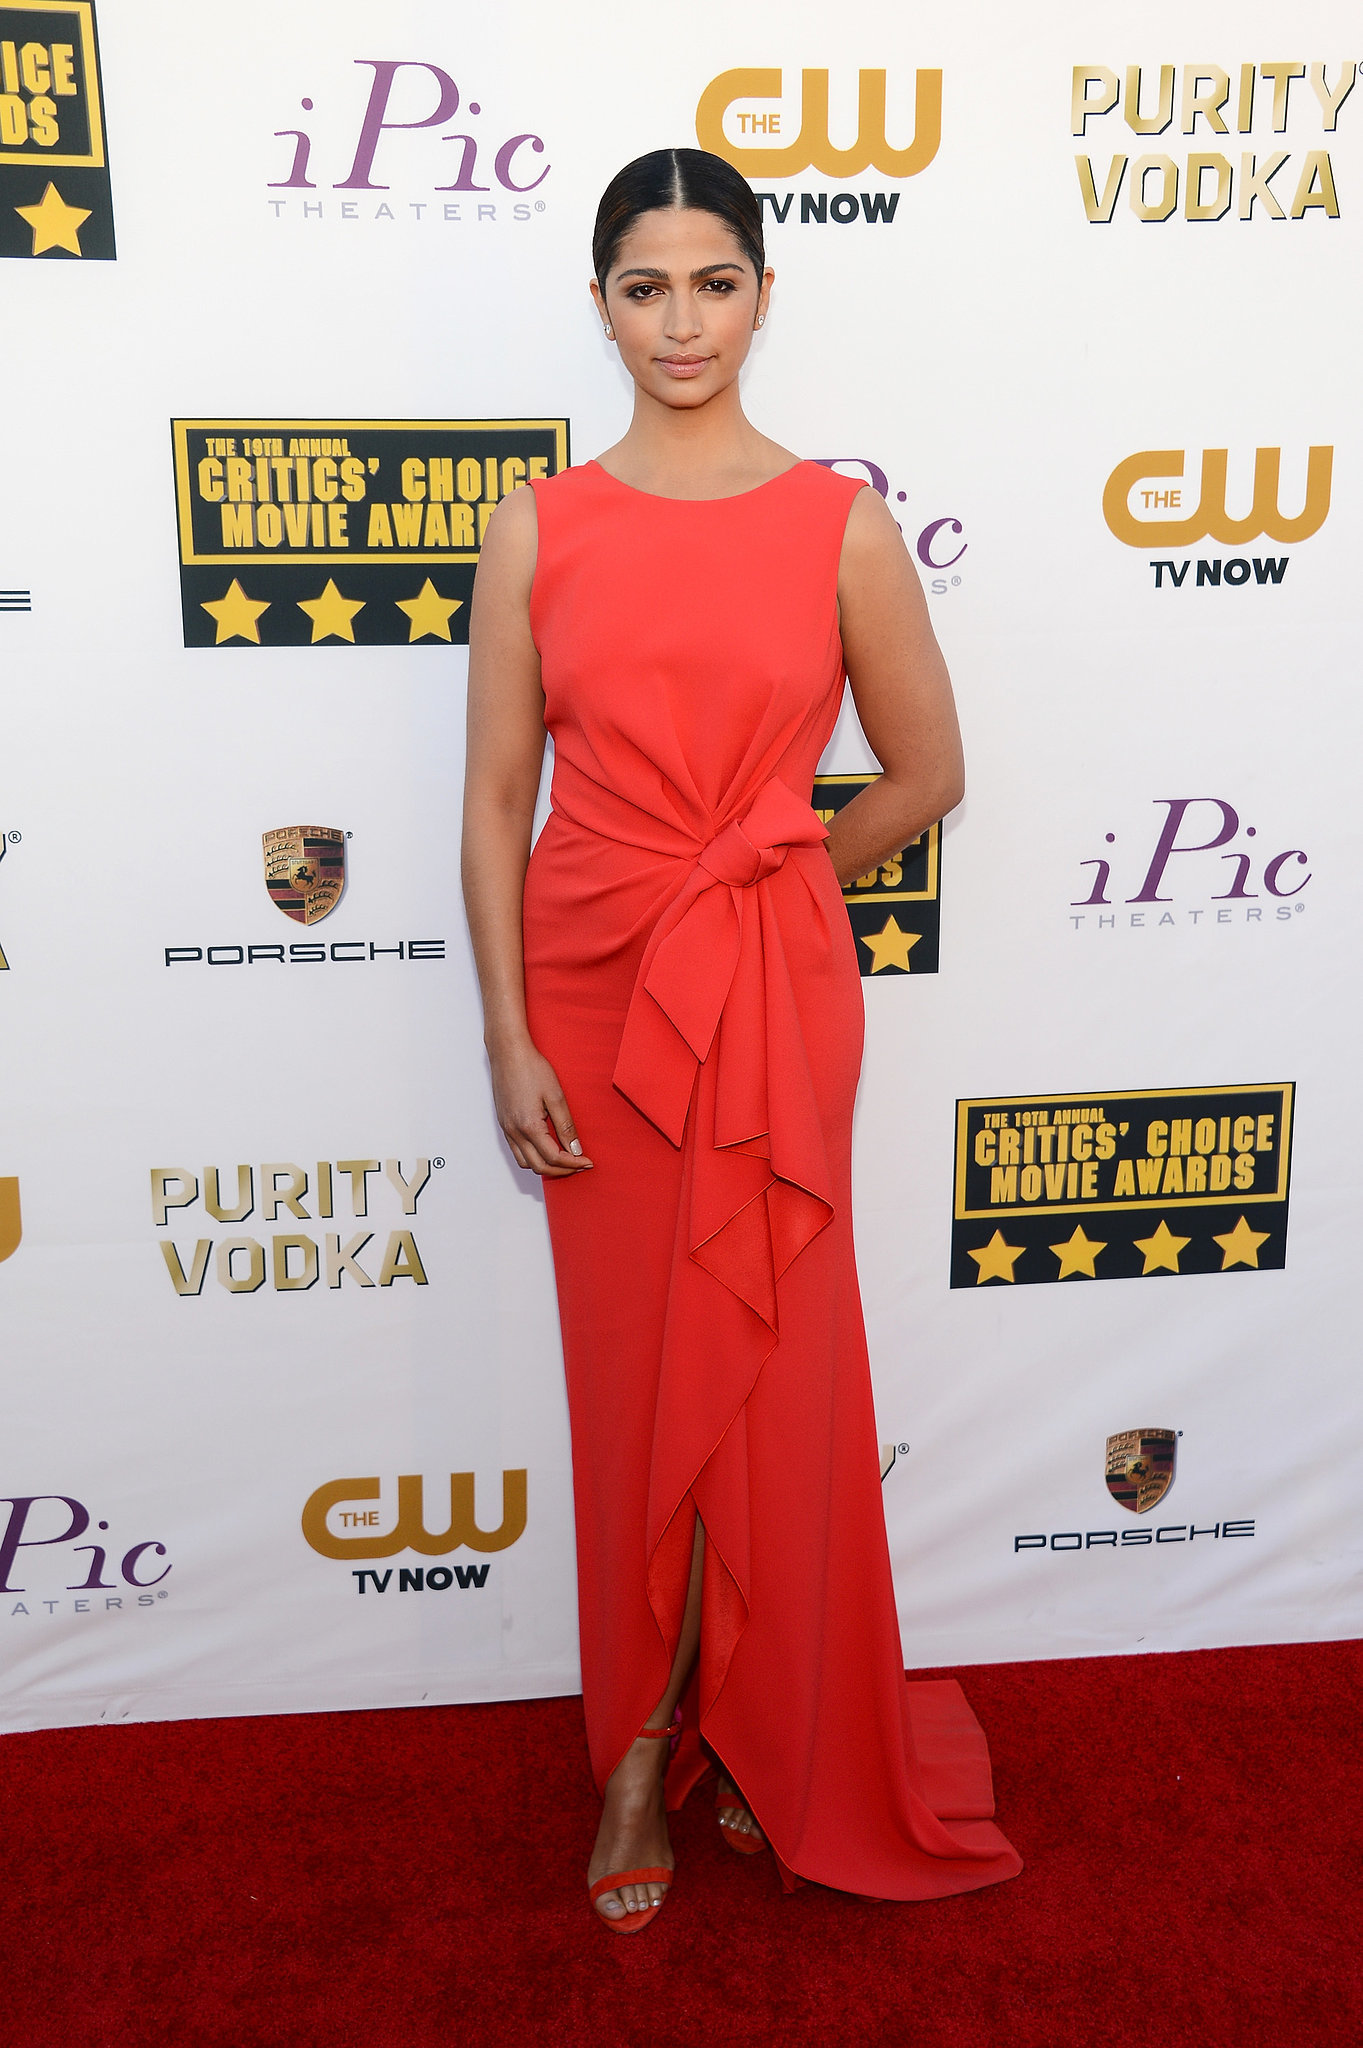 Camila Alves at the Critics' Choice Awards 2014